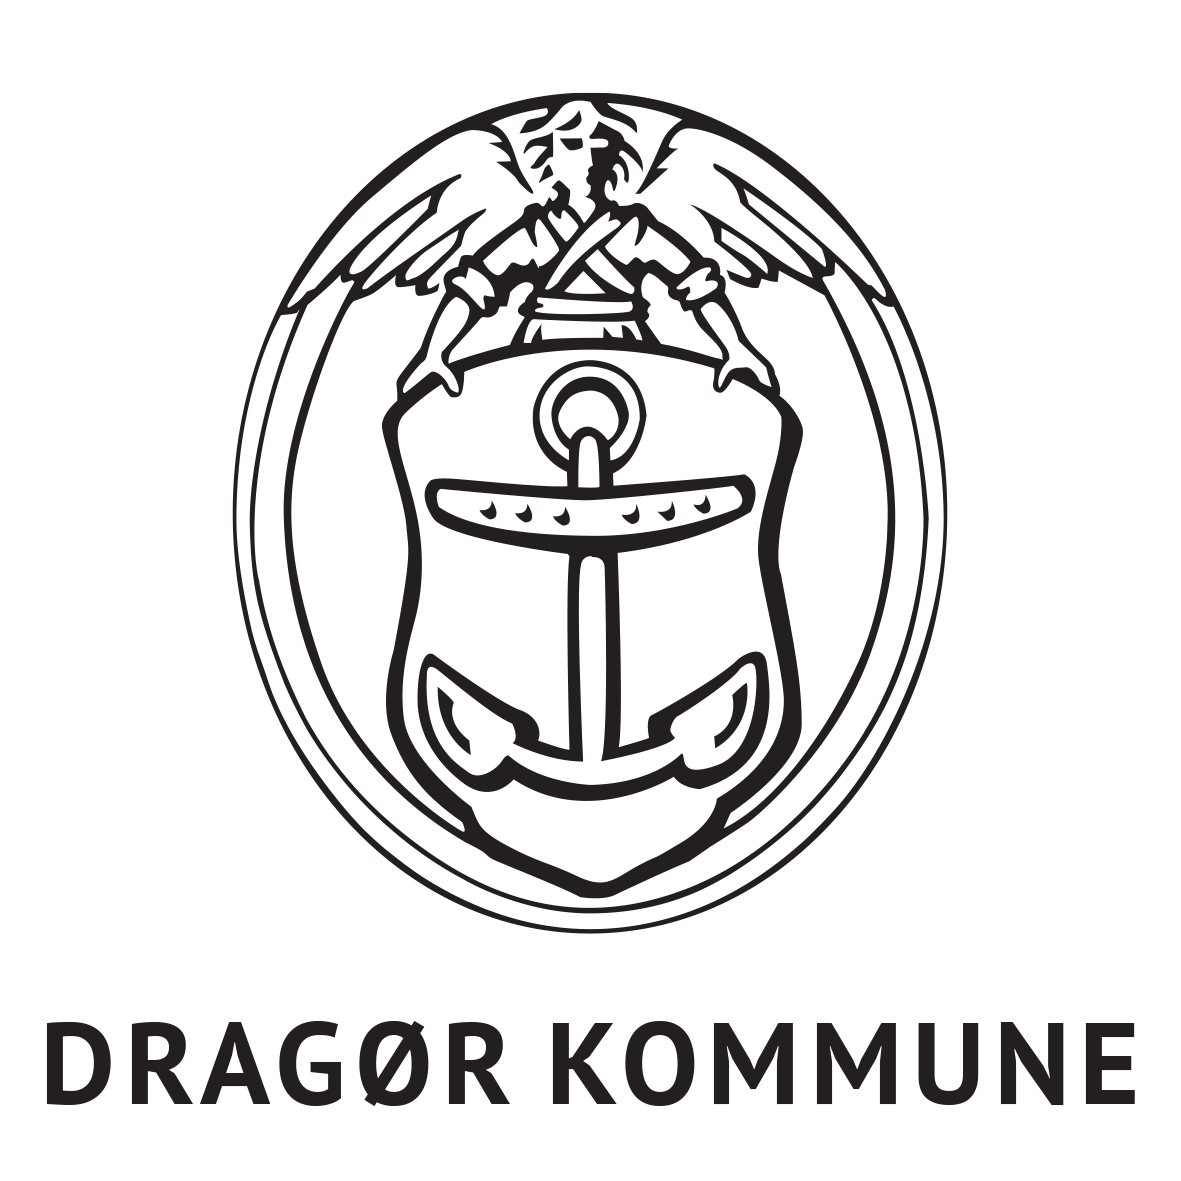 dragoerkommune.png